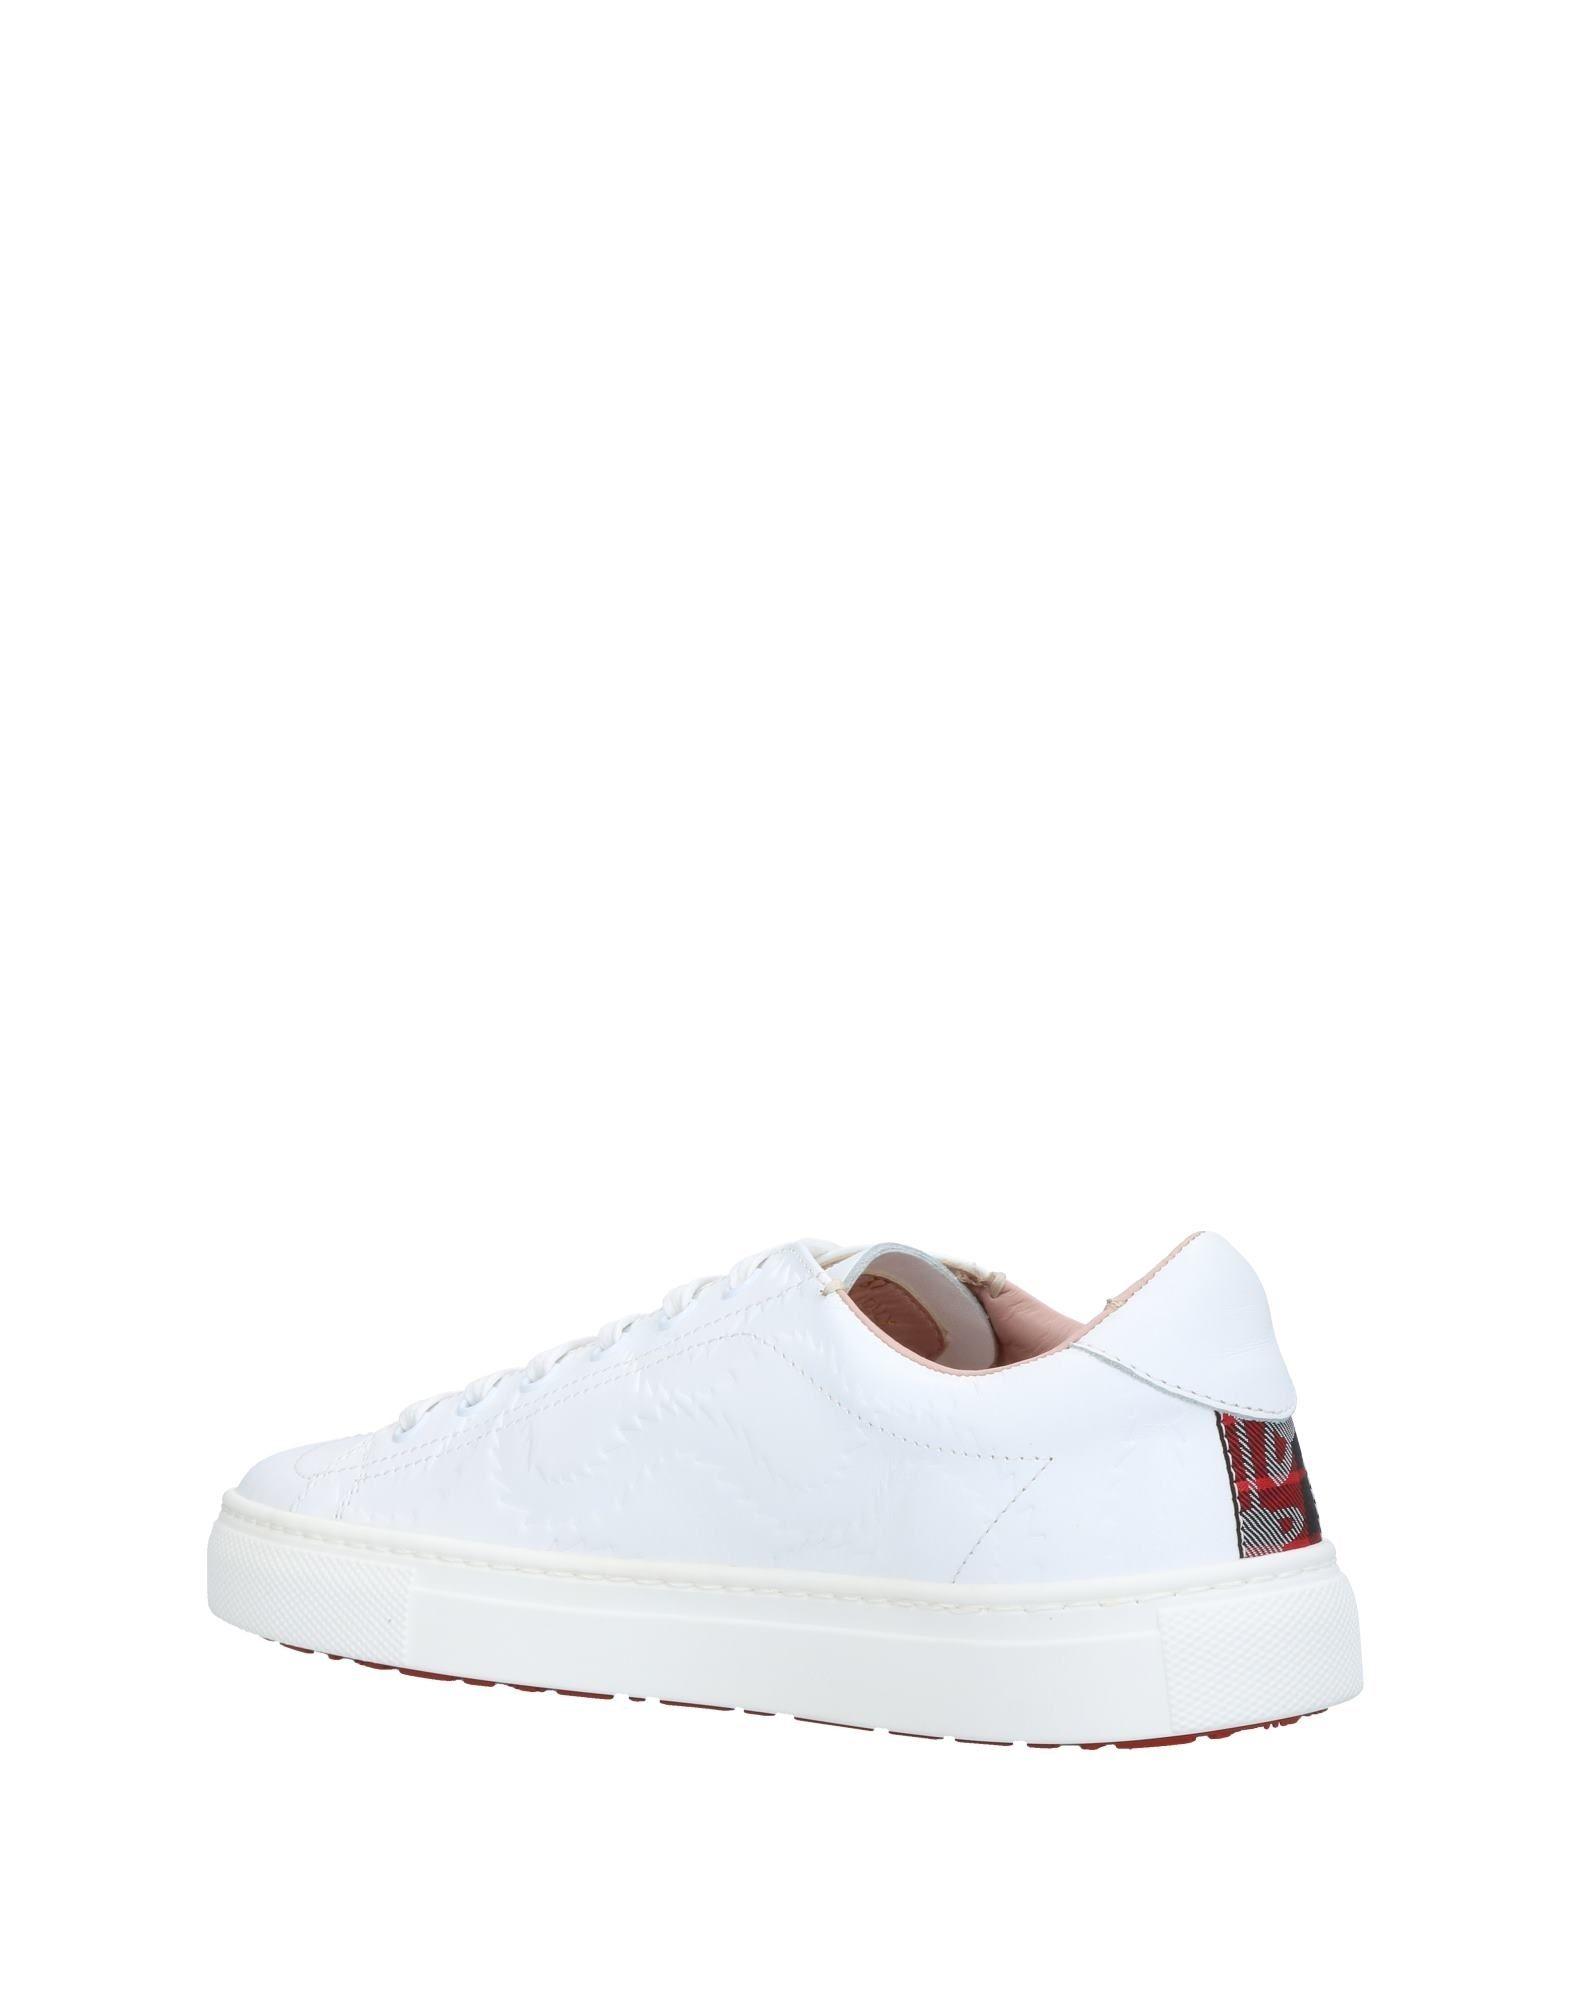 Vivienne Schuhe Westwood Sneakers Damen  11407341MS Neue Schuhe Vivienne b60d8b